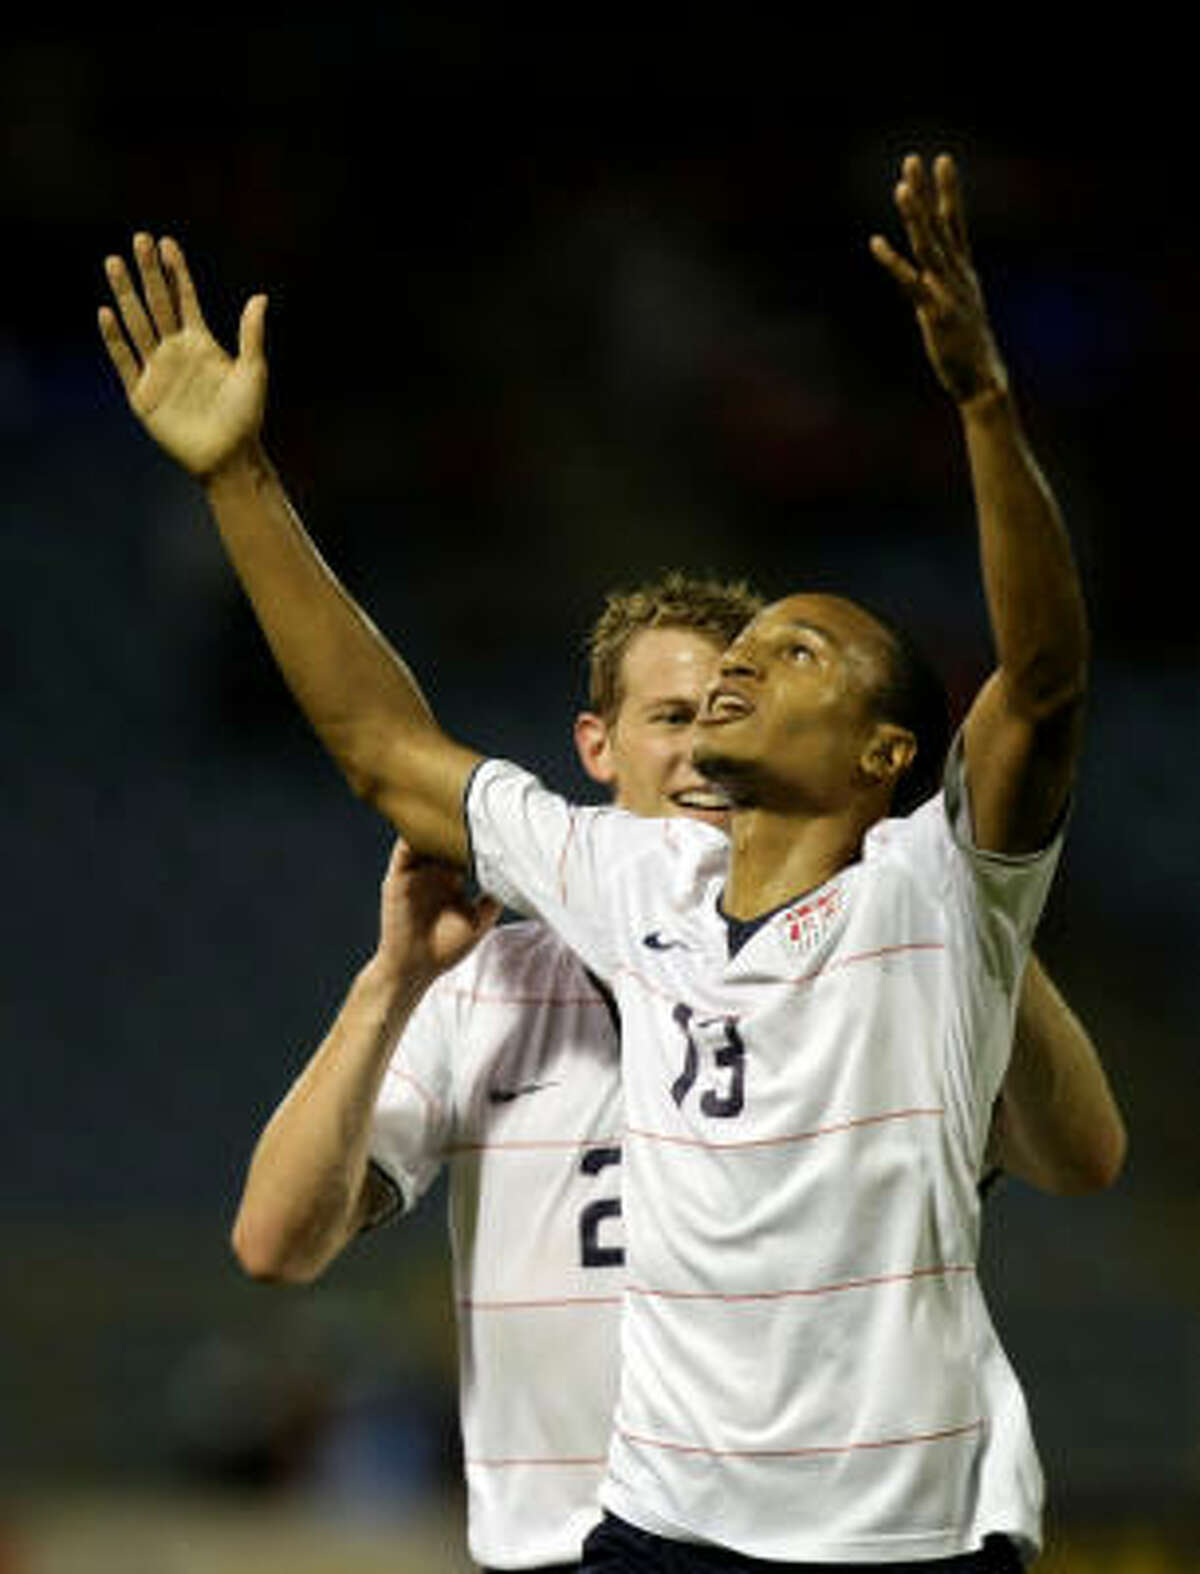 United States 1, Trinidad and Tobago 0 The Dynamo's own Ricardo Clark (13) celebrates scoring the game-winning goal against Trinidad and Tobado.